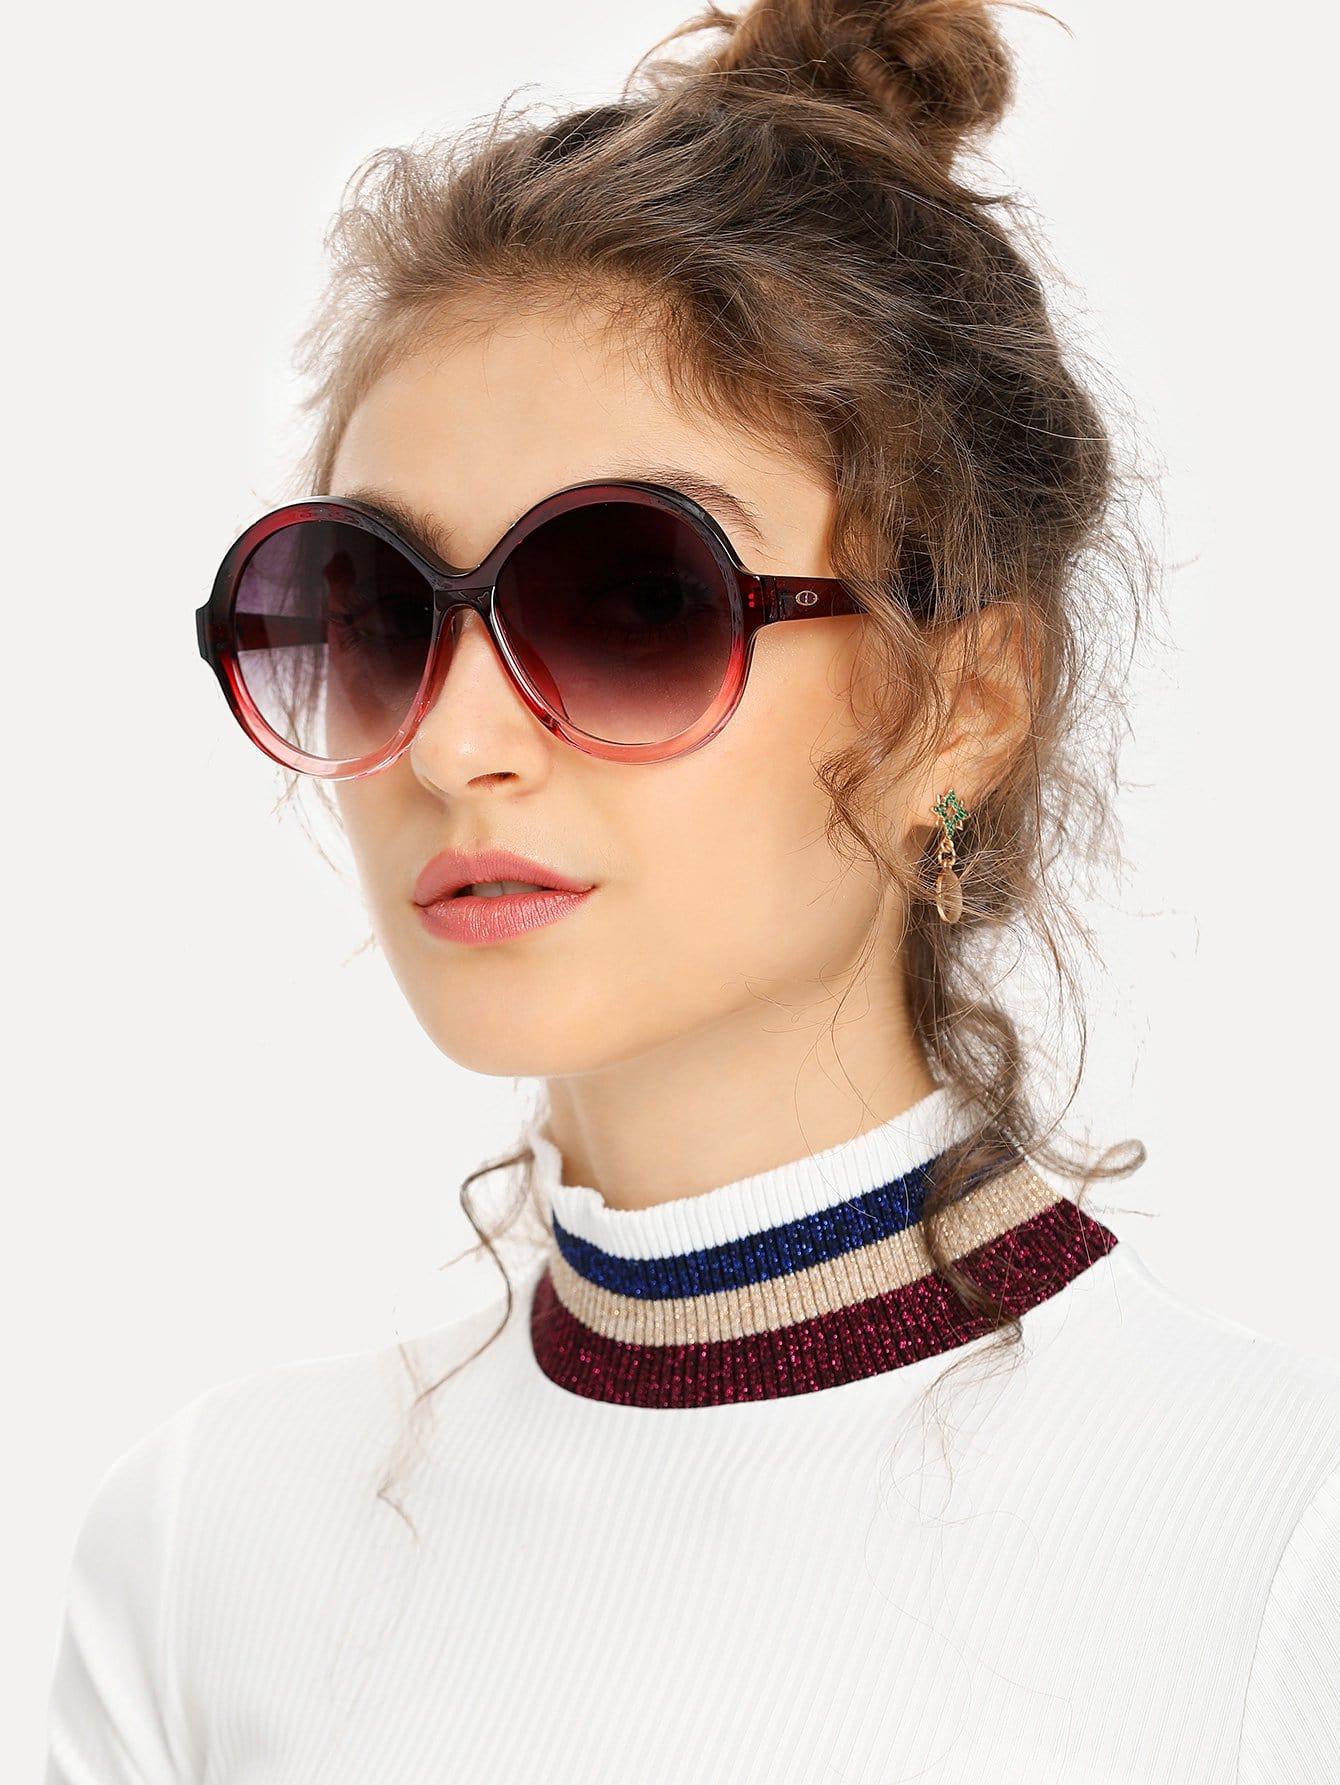 Two Tone Frame Round Lens Sunglasses аппарат для маникюра и педикюра ves vem 104